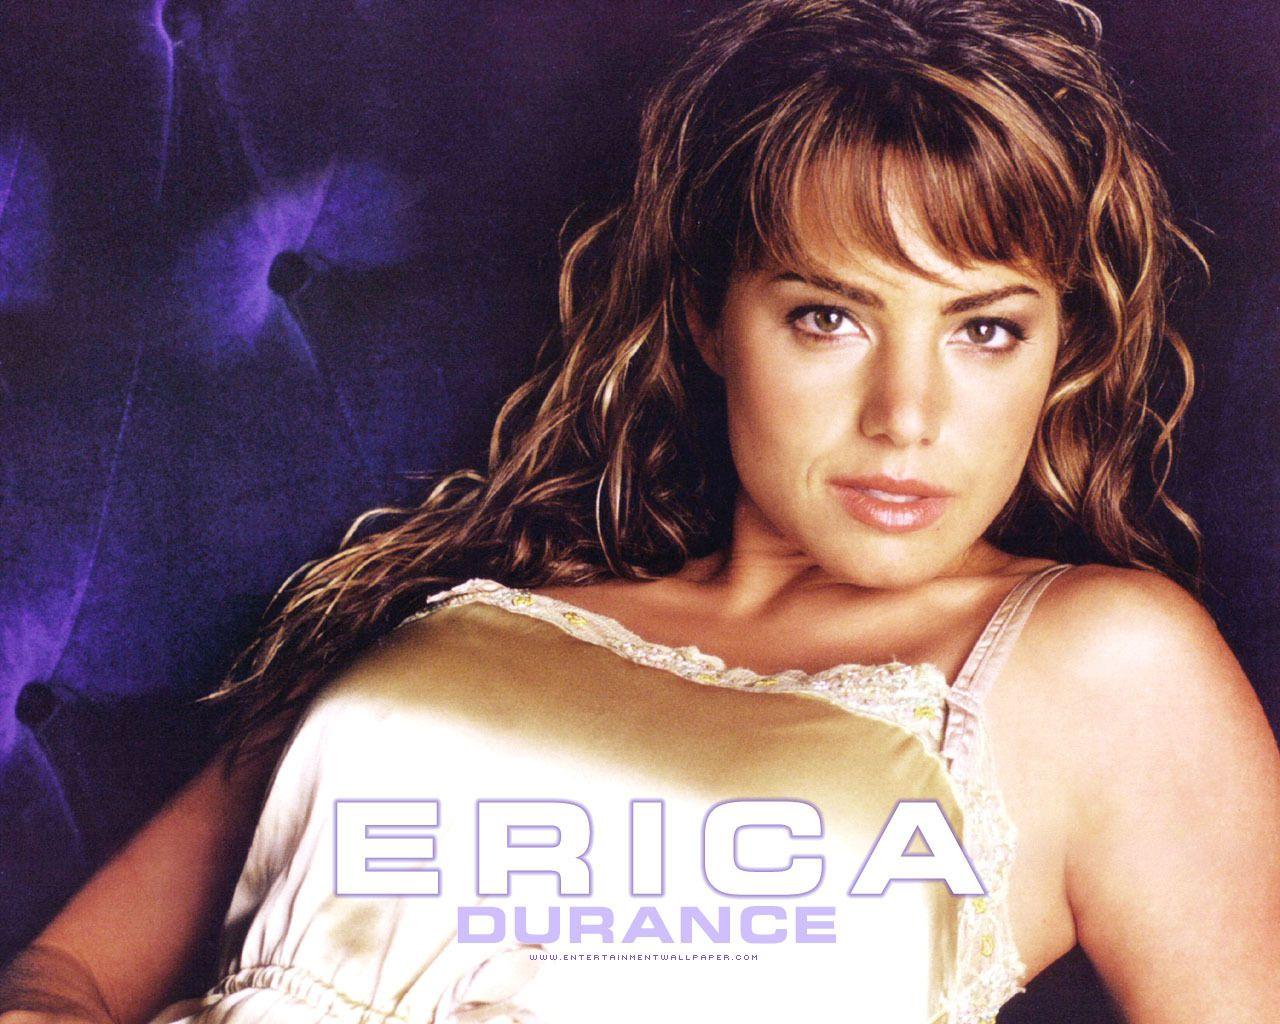 Durance erica Erica Durance